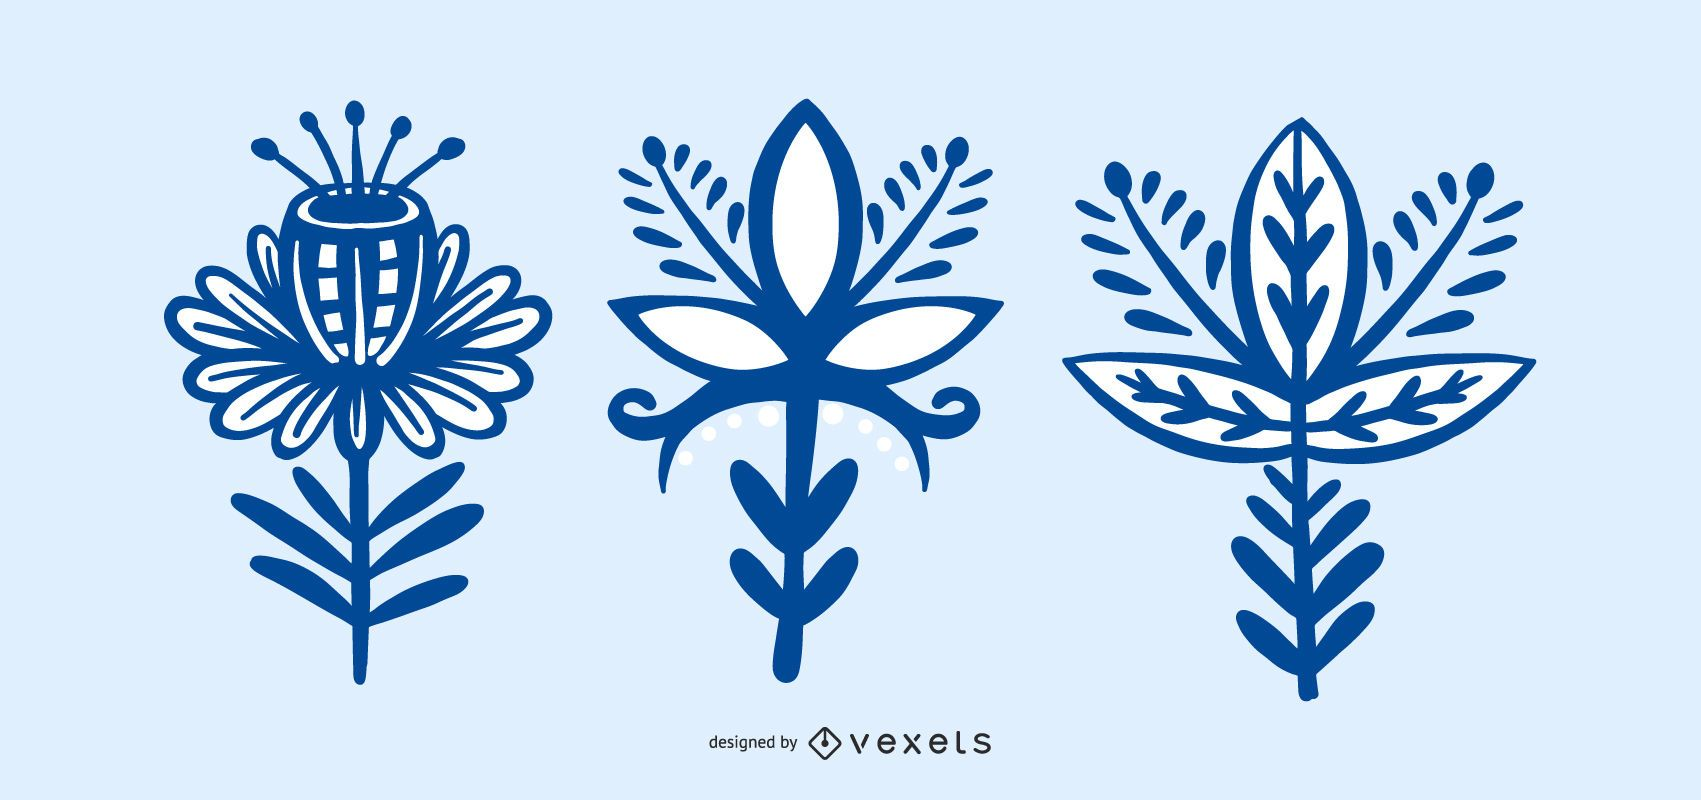 Scandinavian Folk Style Flower Collection